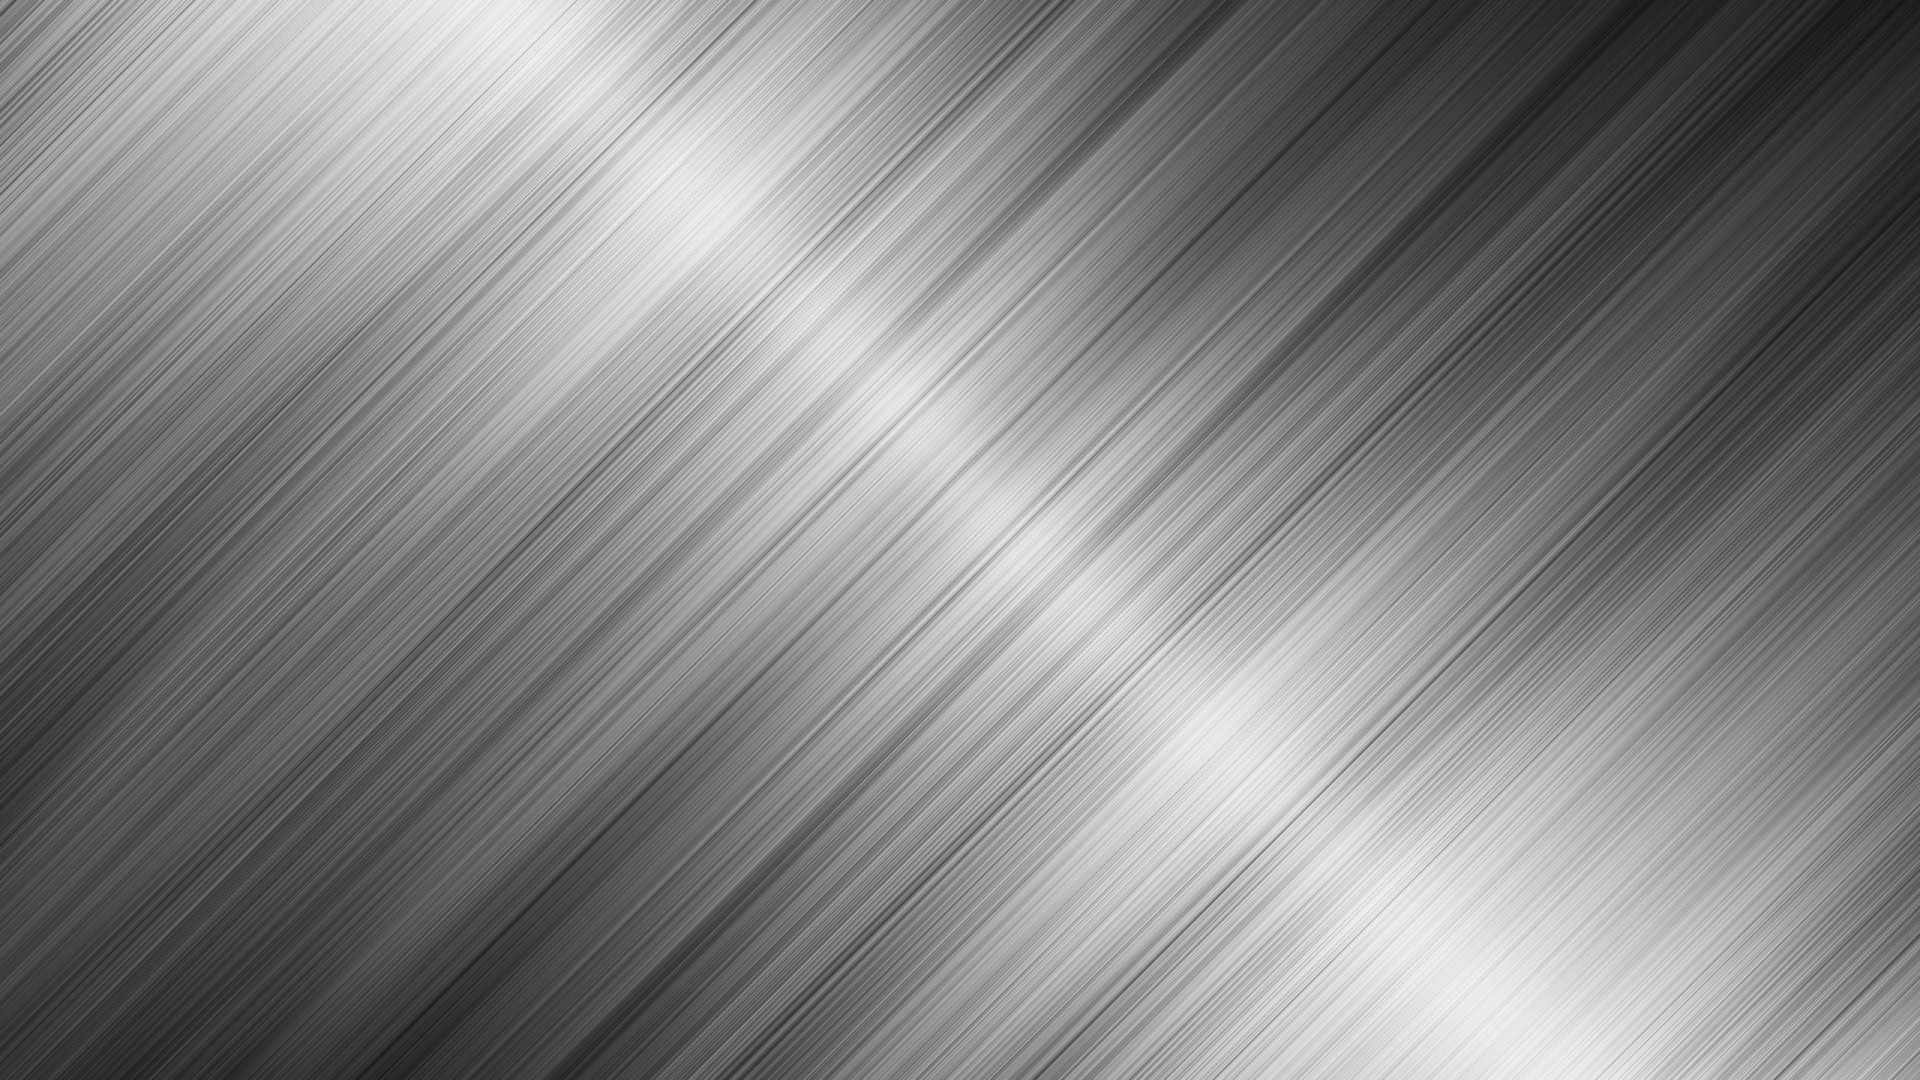 Preview wallpaper metal, lines, stripes, light, shiny, silver 1920×1080